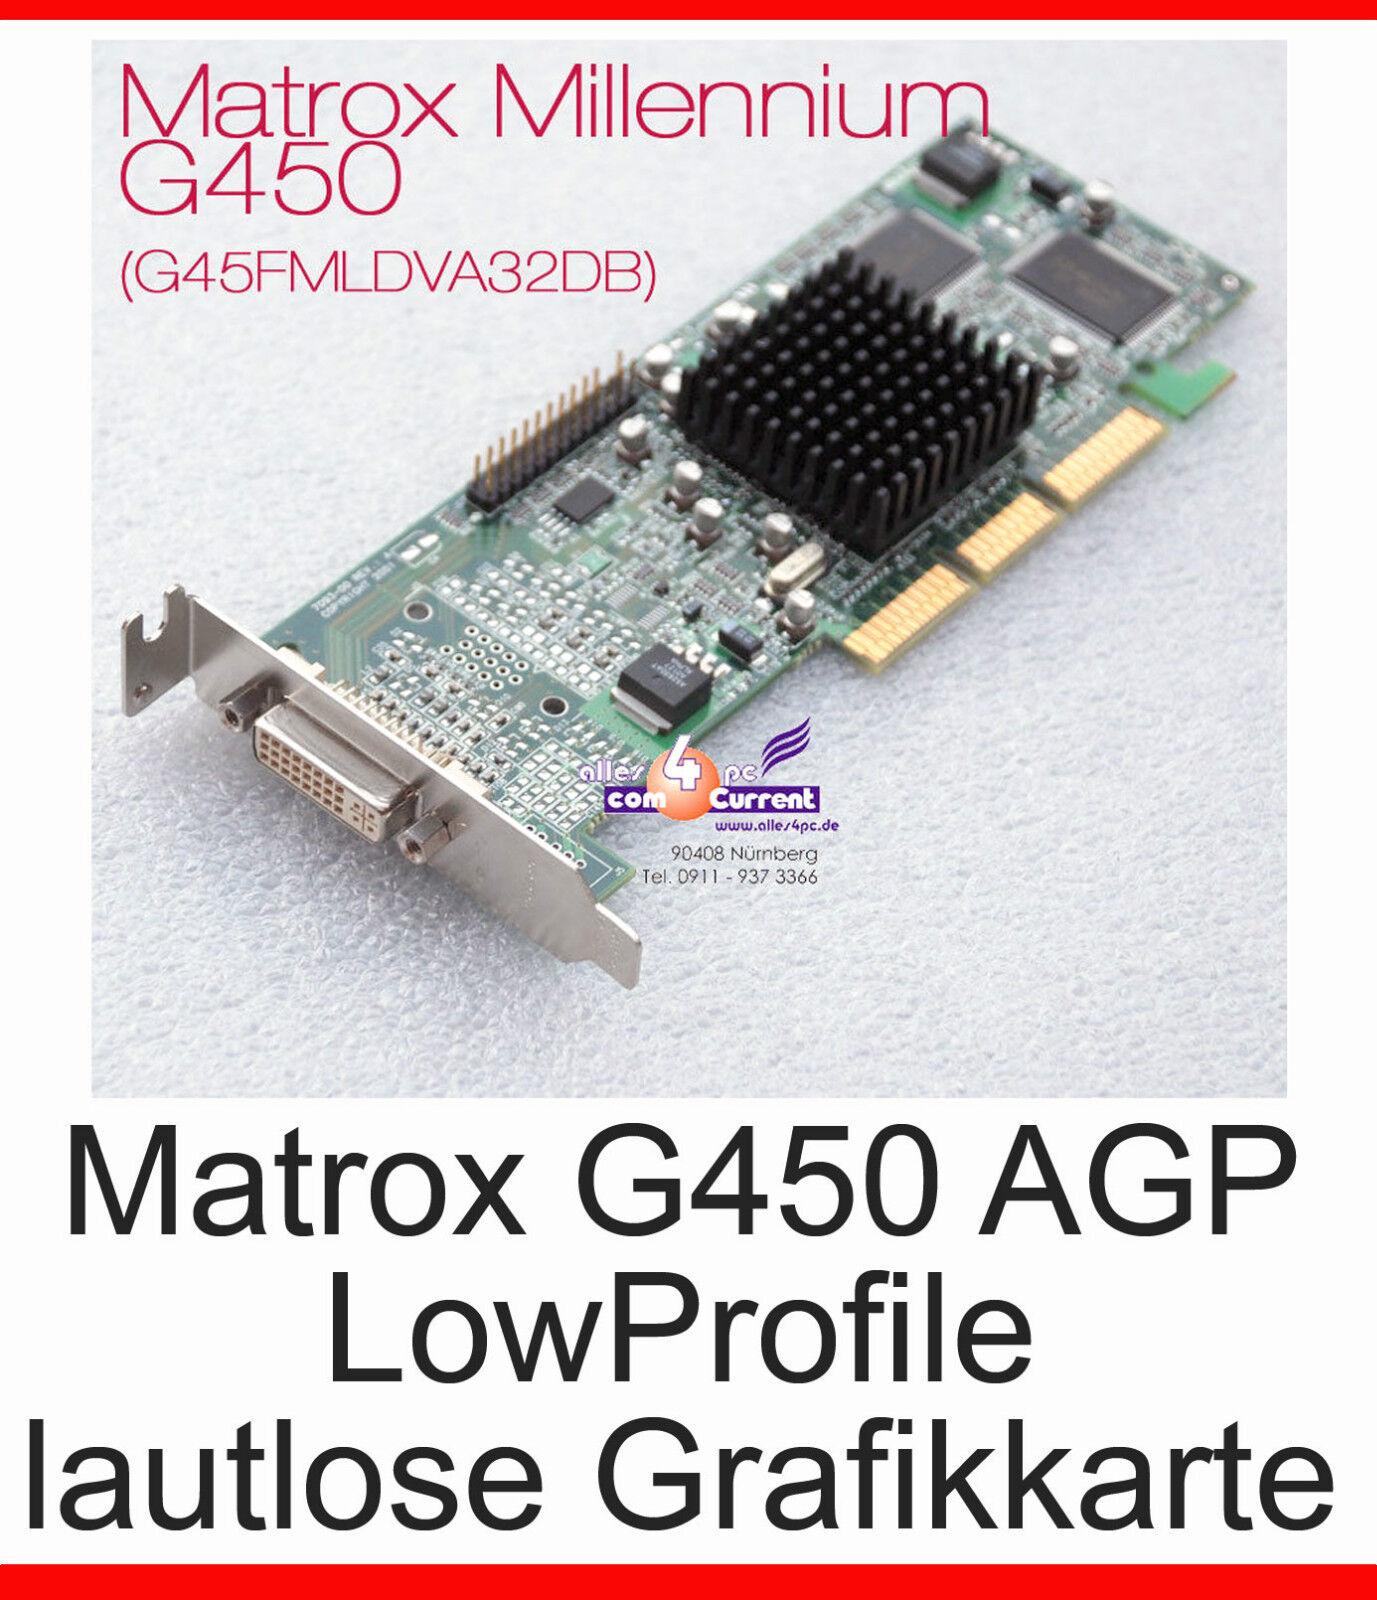 Graphic Card Matrox AGP DVI G450 -32 Low Profile G45FMLDVA32DBF -G21